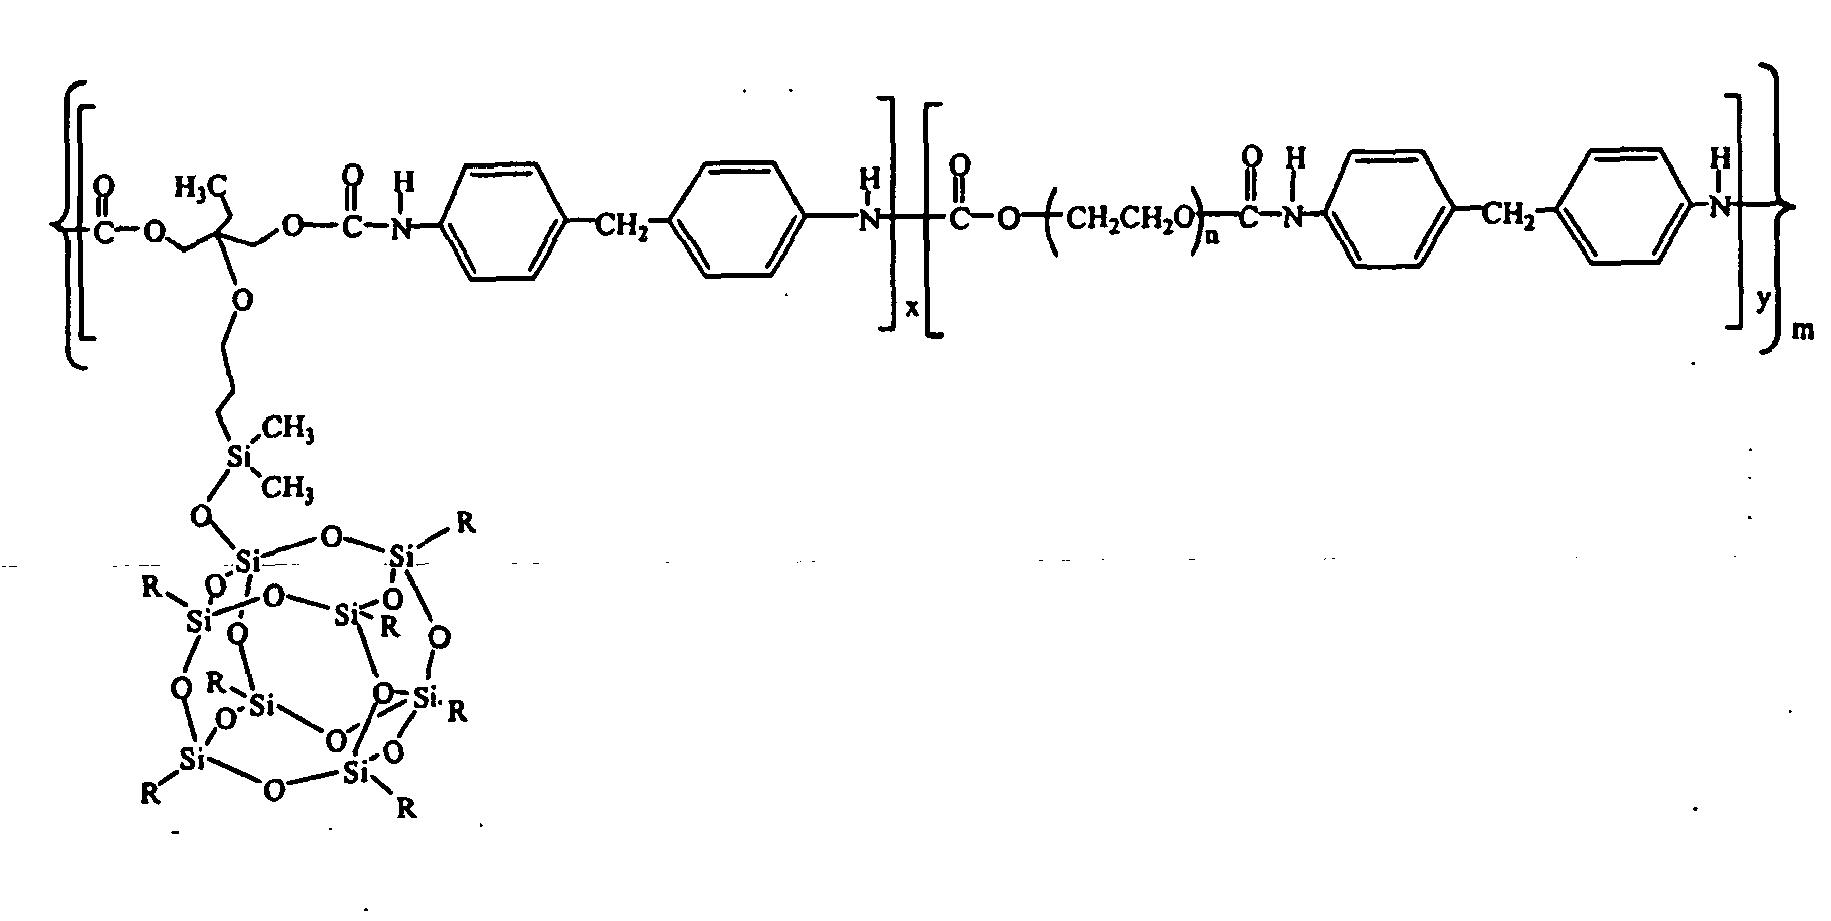 EP1554328B1 - Shape memory polymers based on semicrystalline